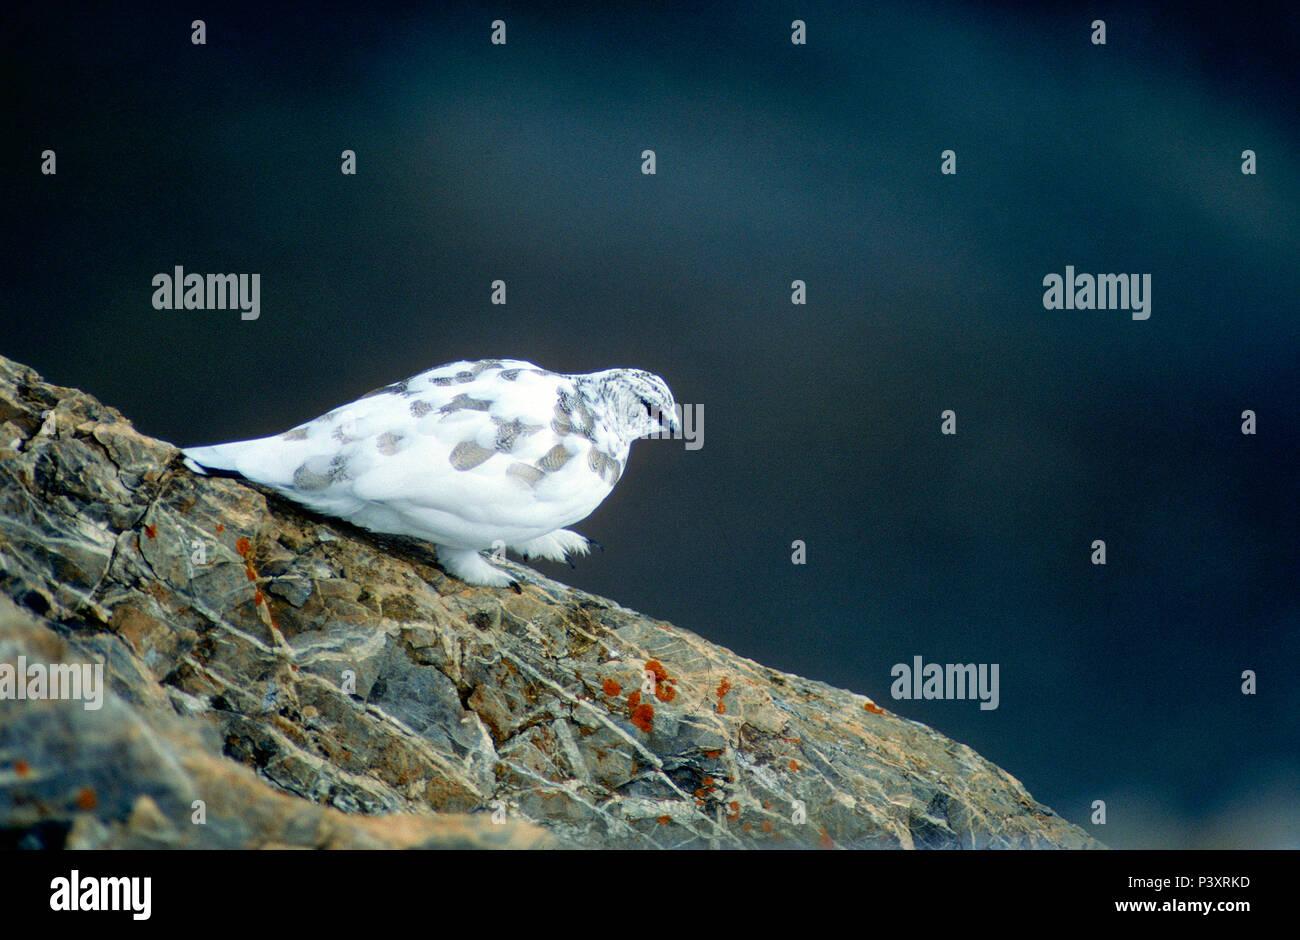 Rock Ptarmigan, Lagopus mura, Phasianidae, winter dress, bird, animal, Cassonsgrat, Flimserstein, Flims, Canton of Graubünden, Switzerland - Stock Image